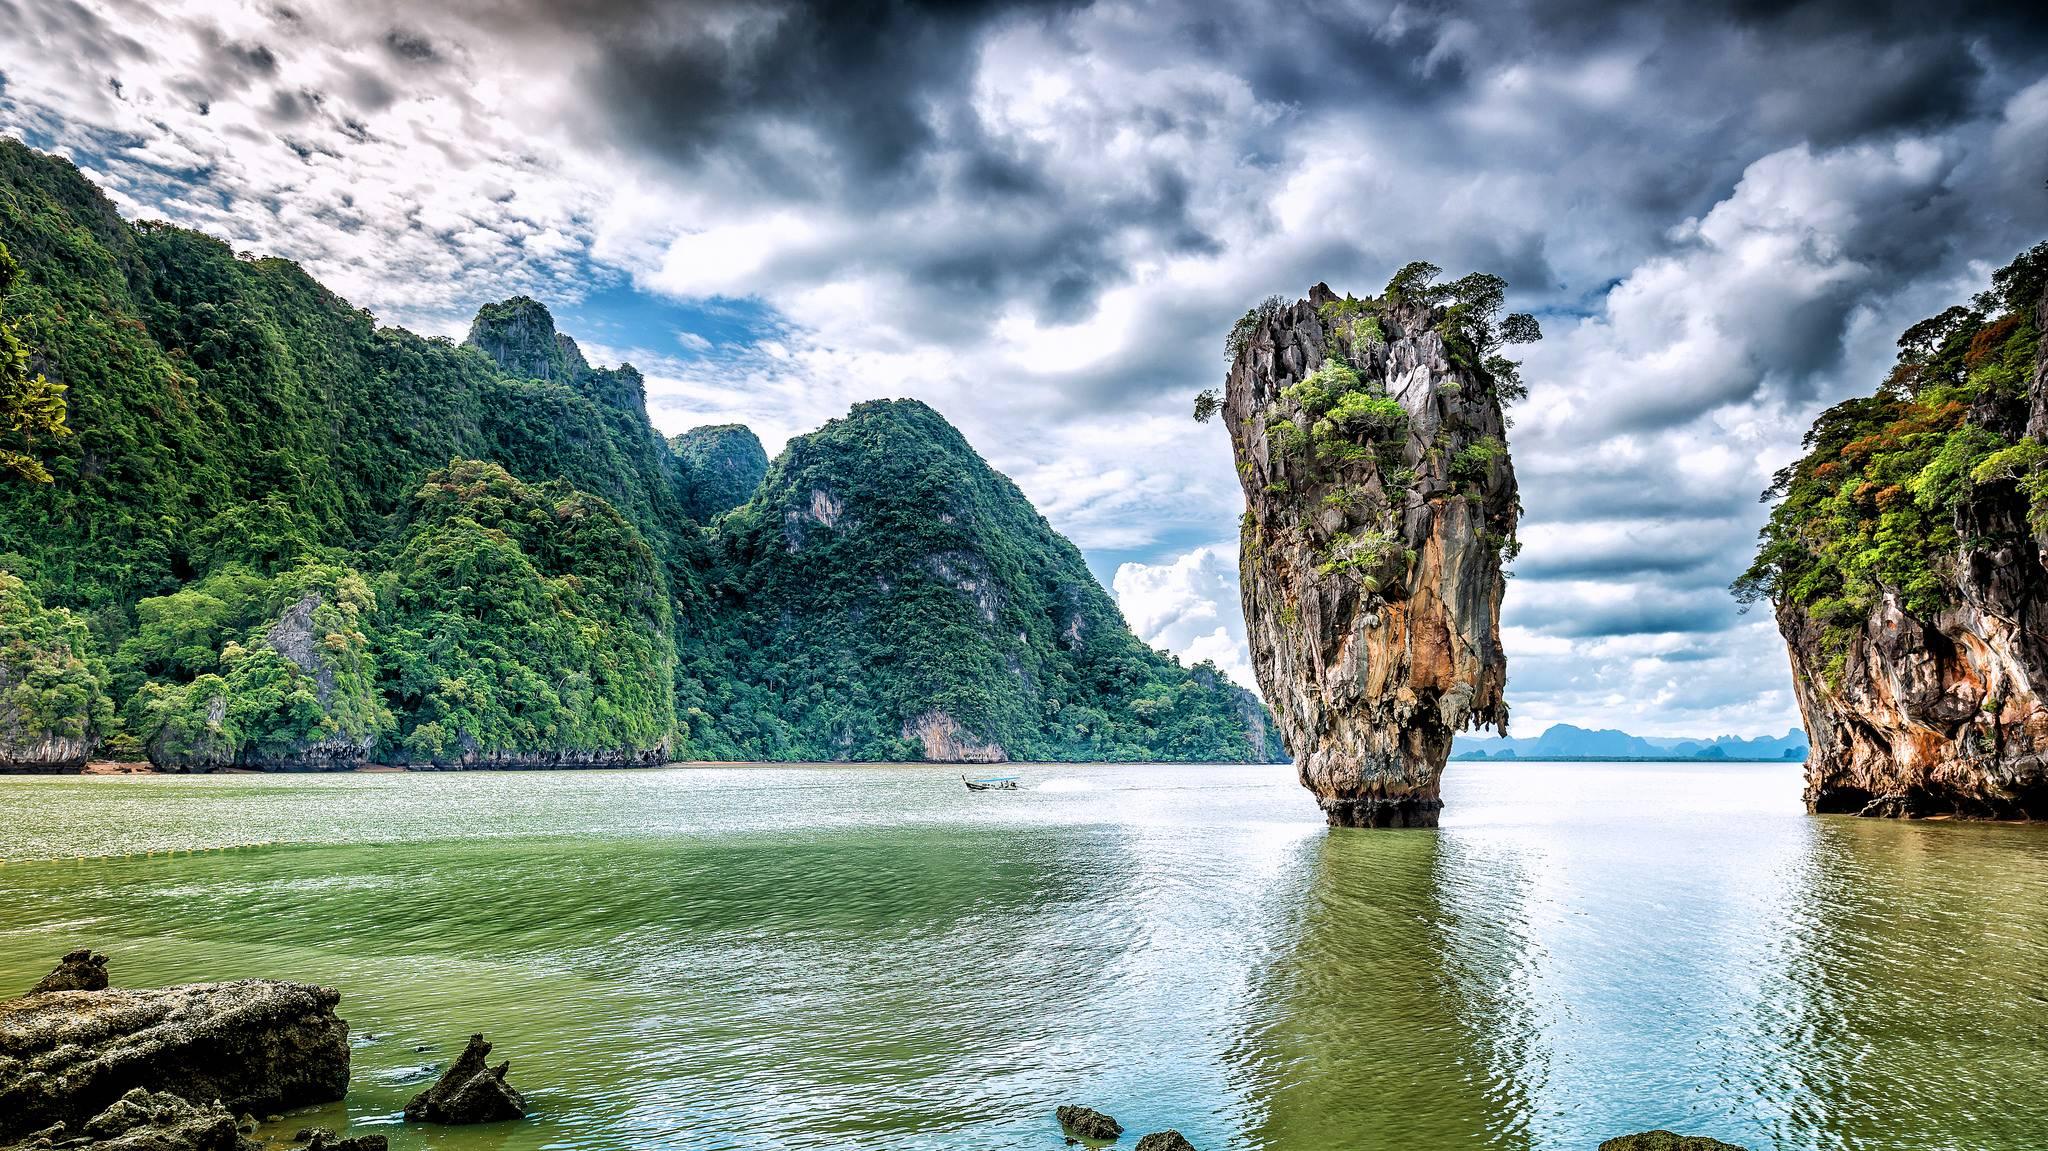 Остров Джеймса Бонда, Пхангнга, Таиланд